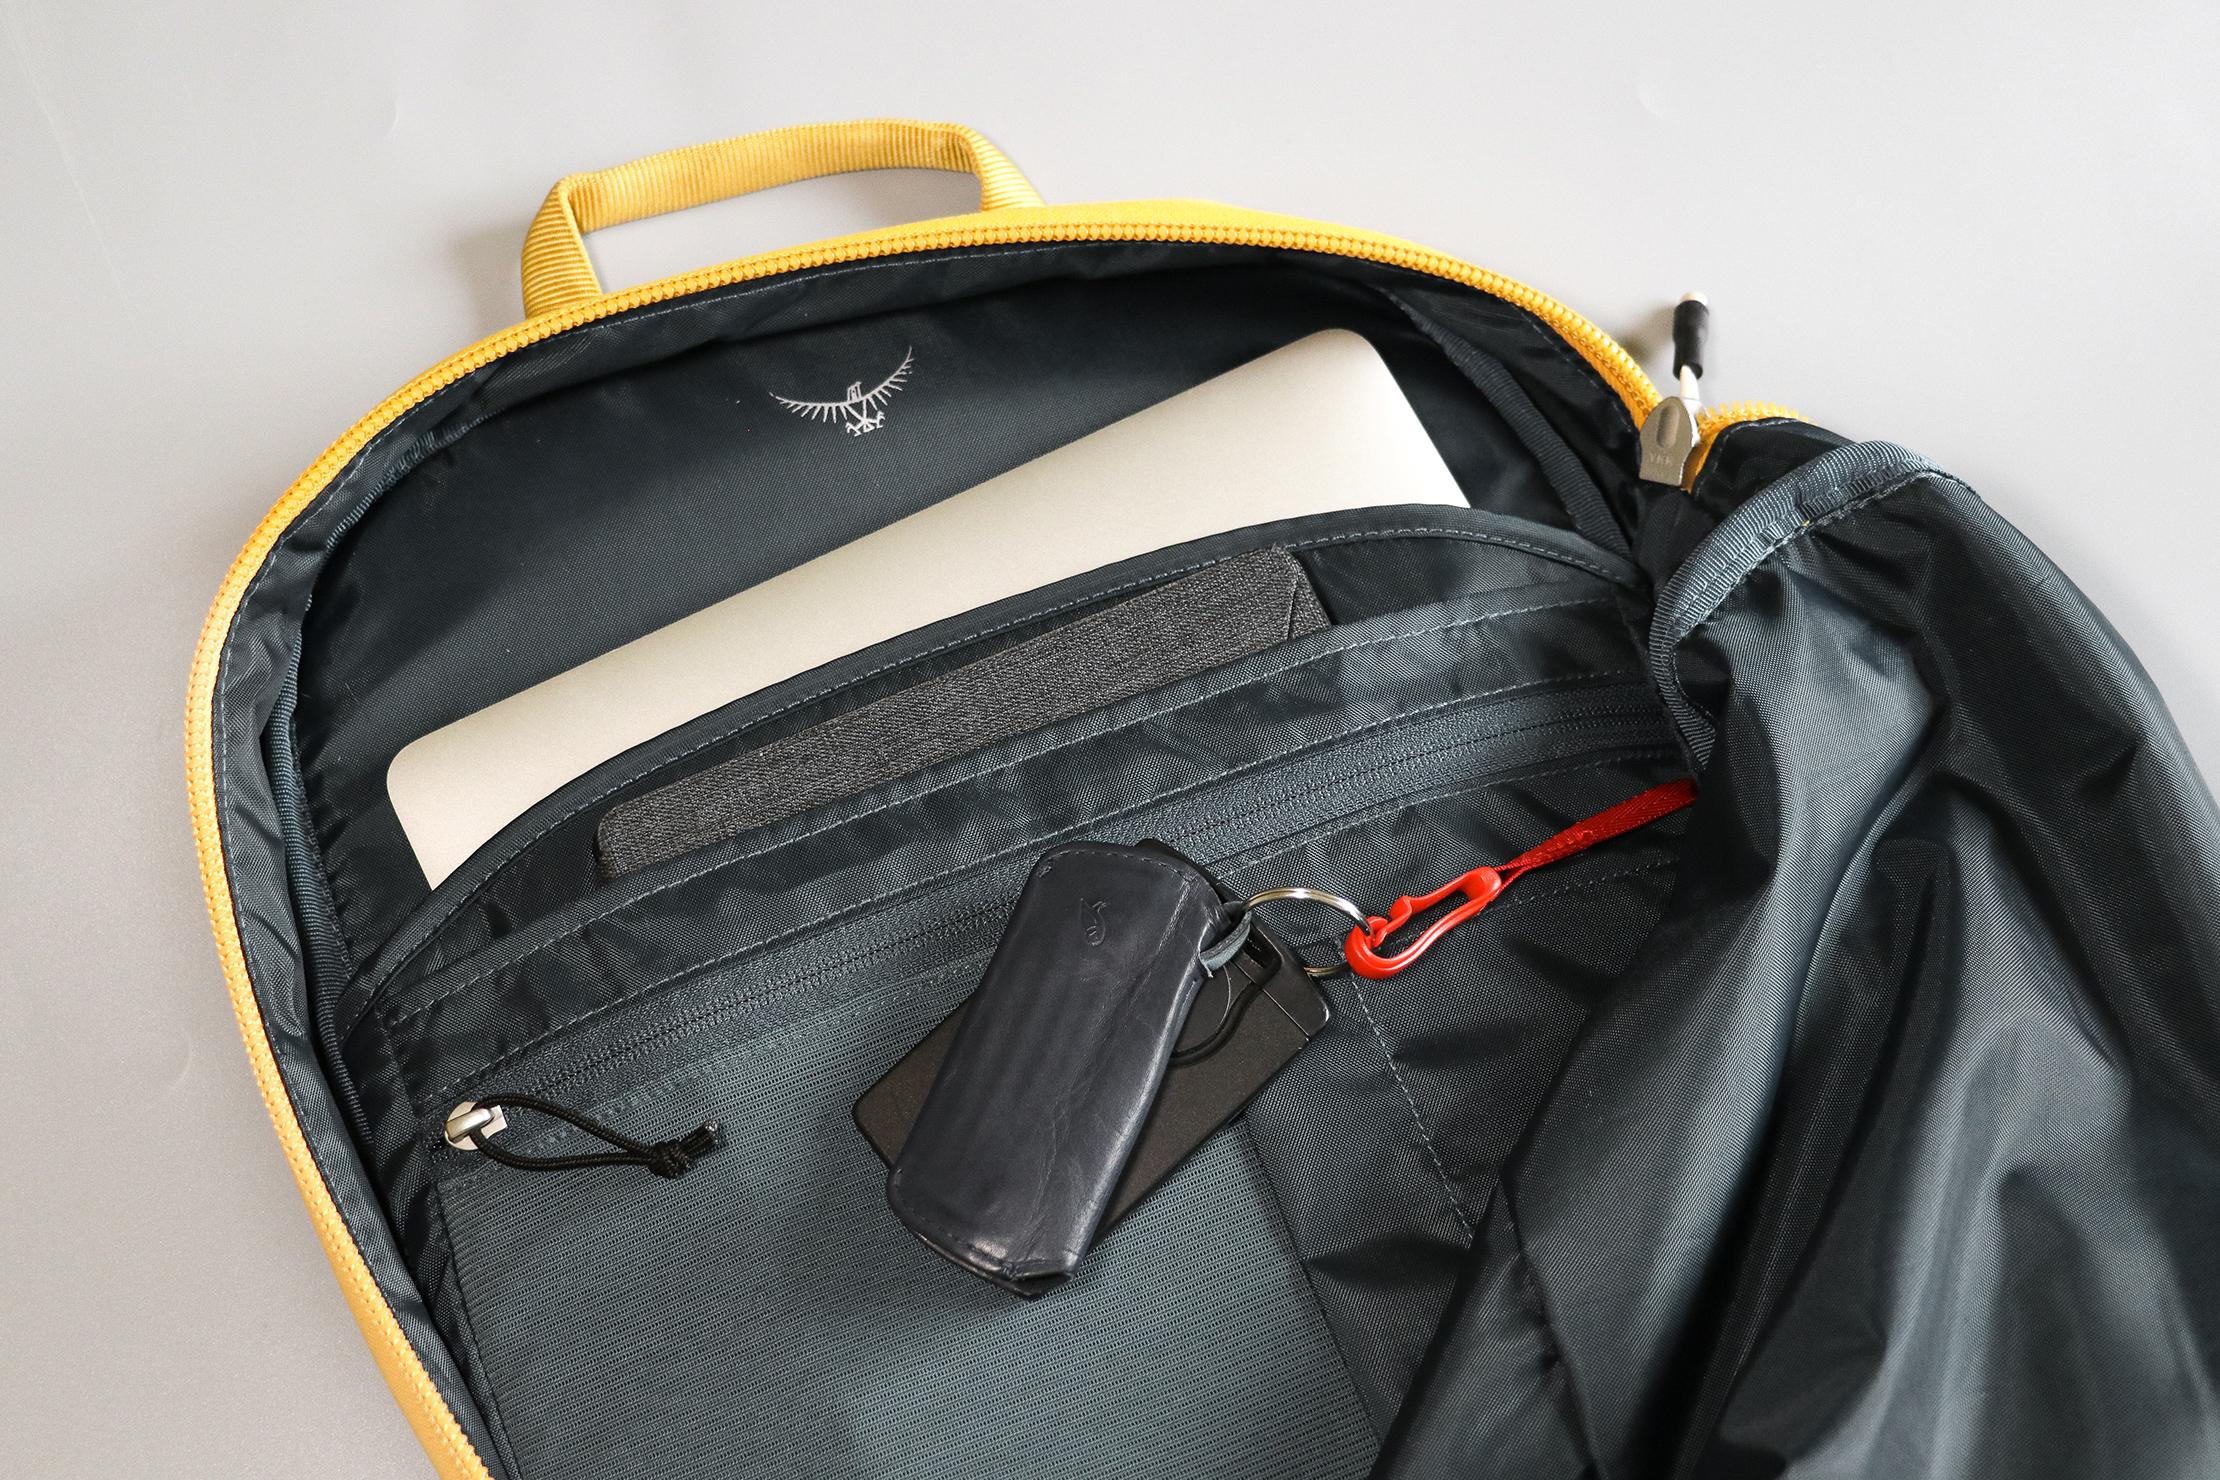 Osprey Arcane Large Day Pack (V2) Main Compartment Organization